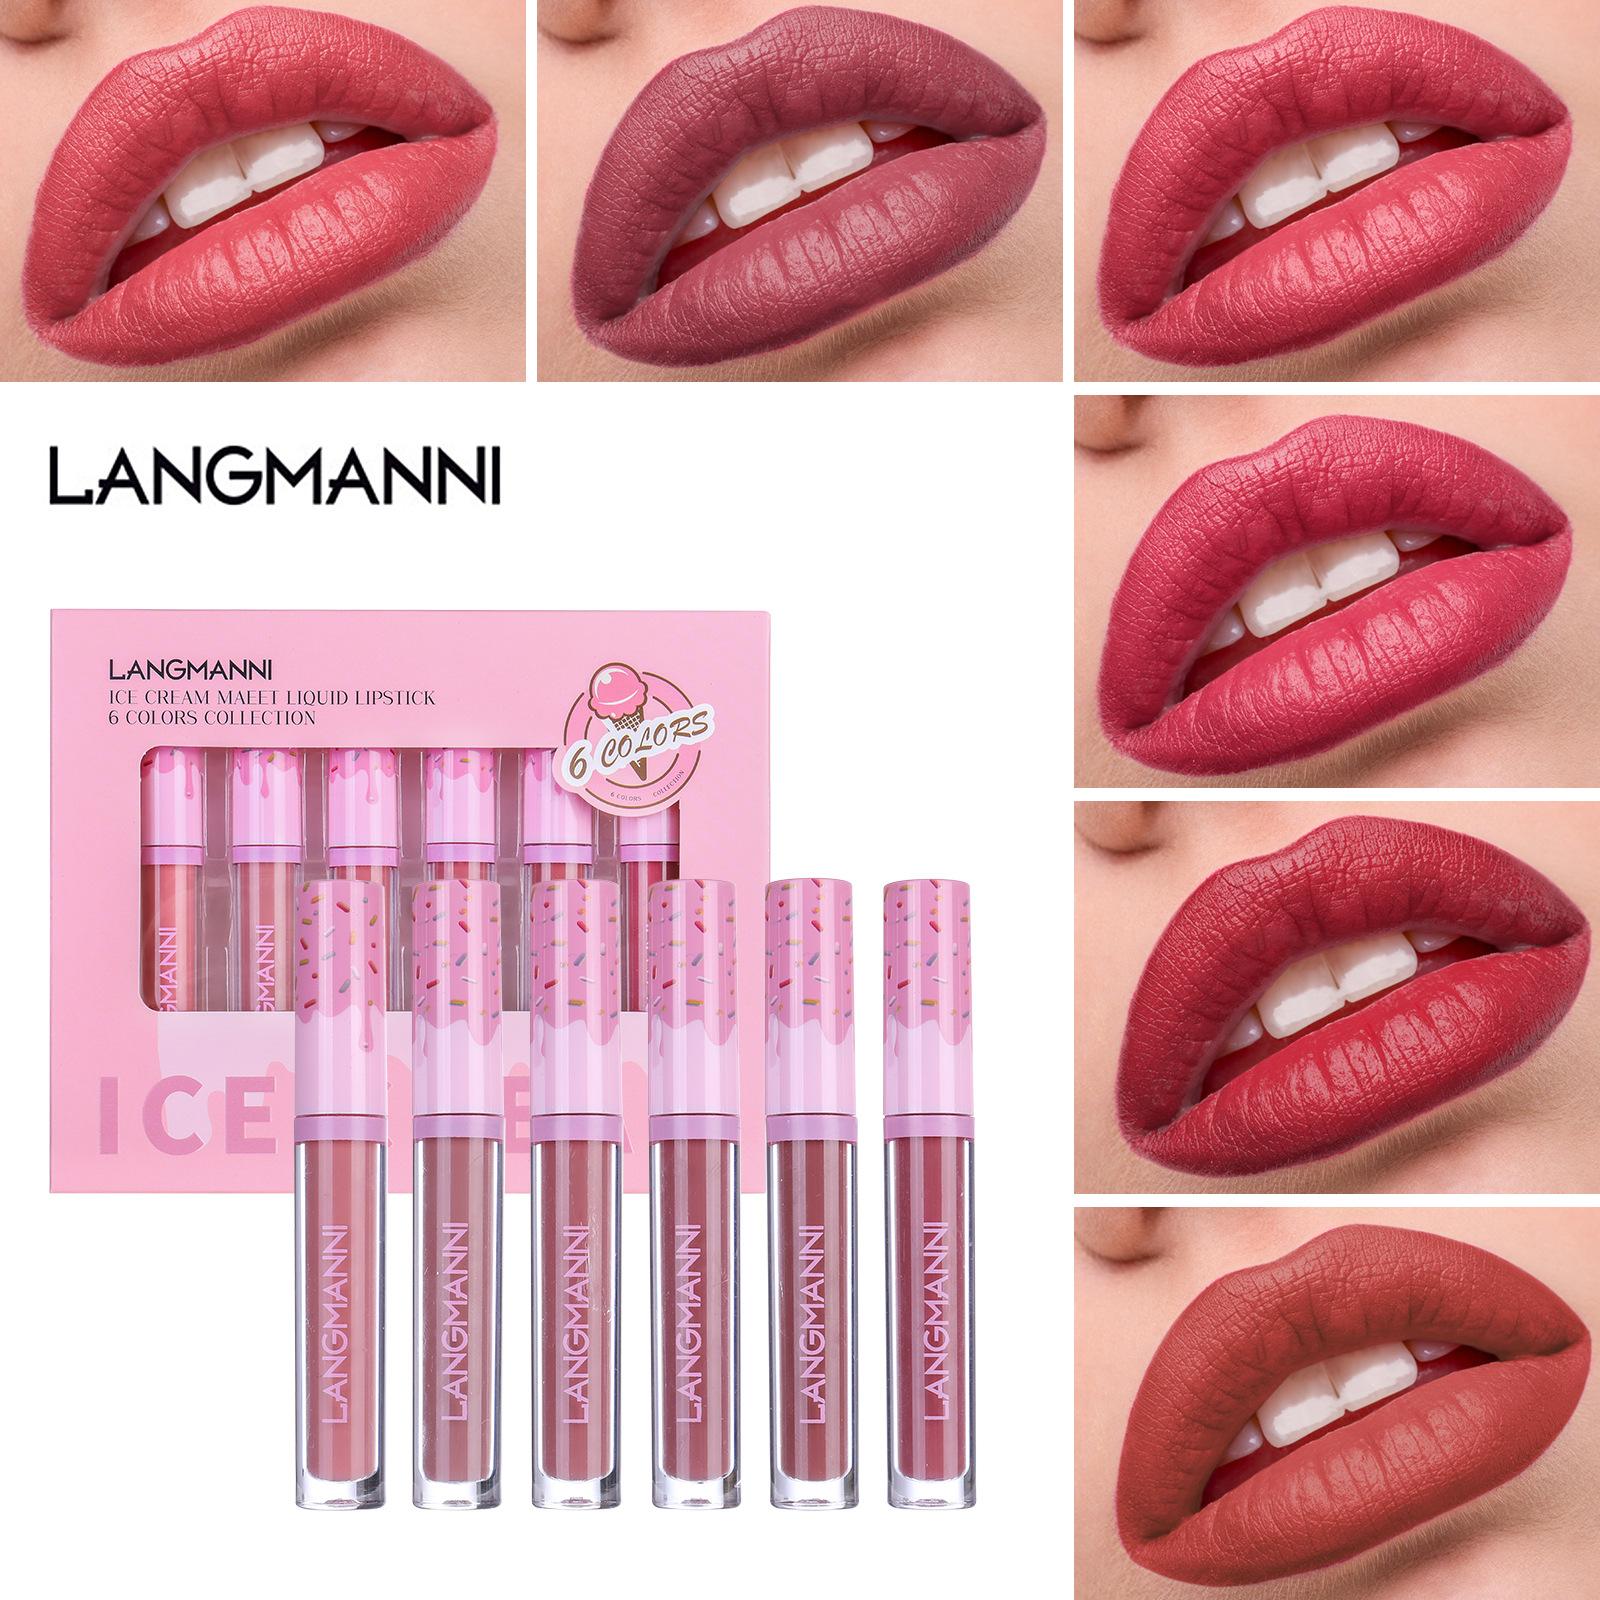 6 Colors/Sets Velvet Matte Liquid Lipstick Lip gloss Sexy Makeup Moisturizer Waterproof Lip Glosses Gift Box B